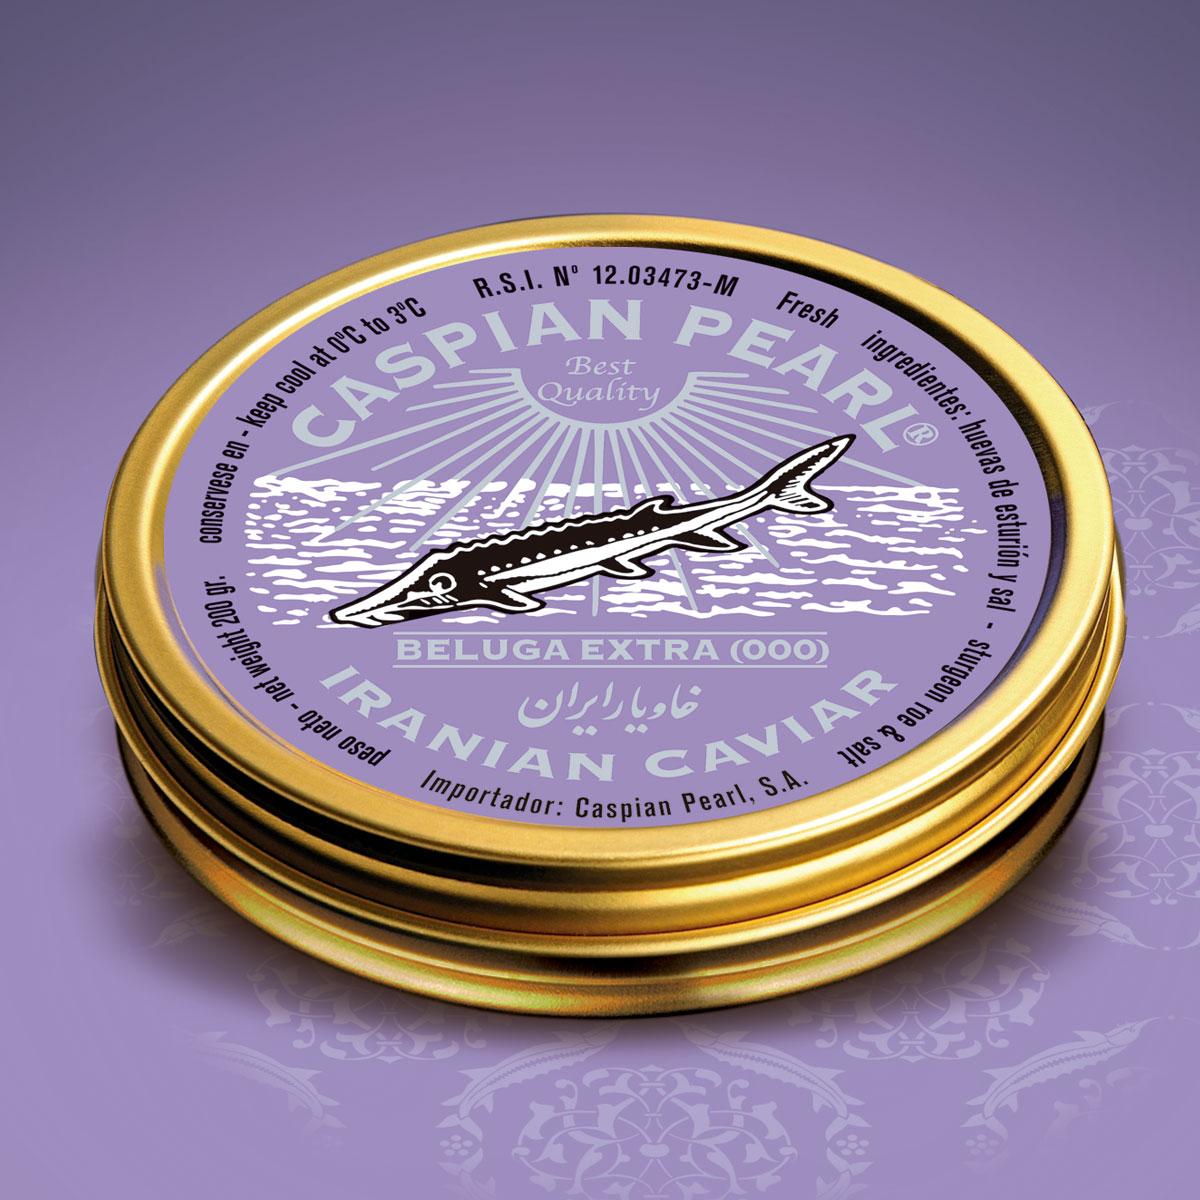 Caspian Pearl. Posts Instagram para La Marca del Caviar. Caviar Beluga Imperial Extra (000)